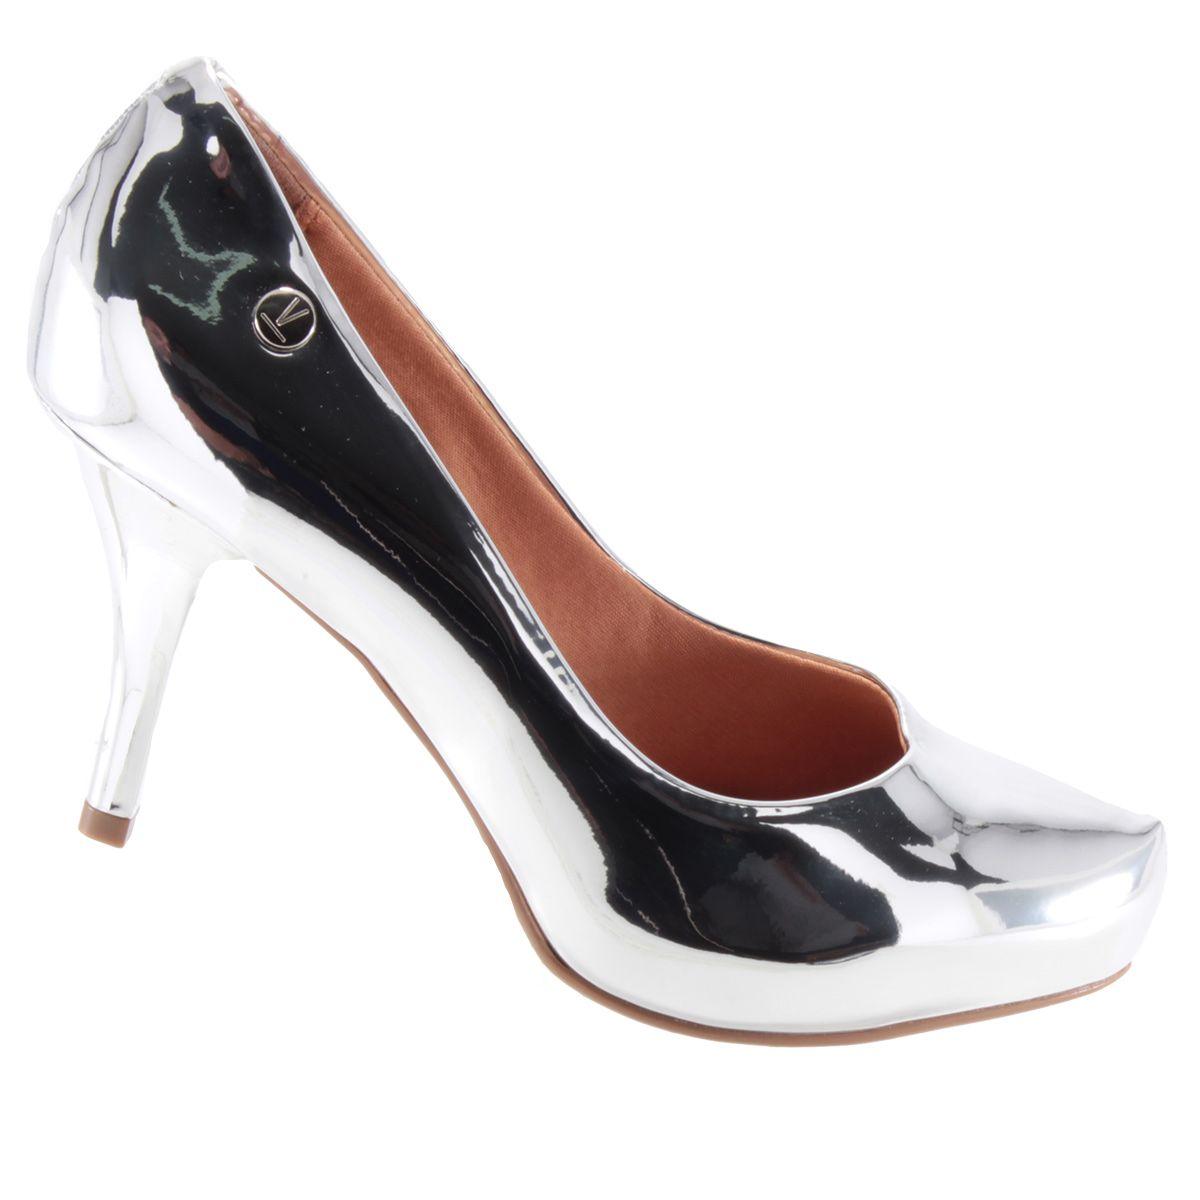 Scarpin Vizzano Sapato Feminino Salto Alto Meia Pata Metalizado 1781621  - Ian Calçados